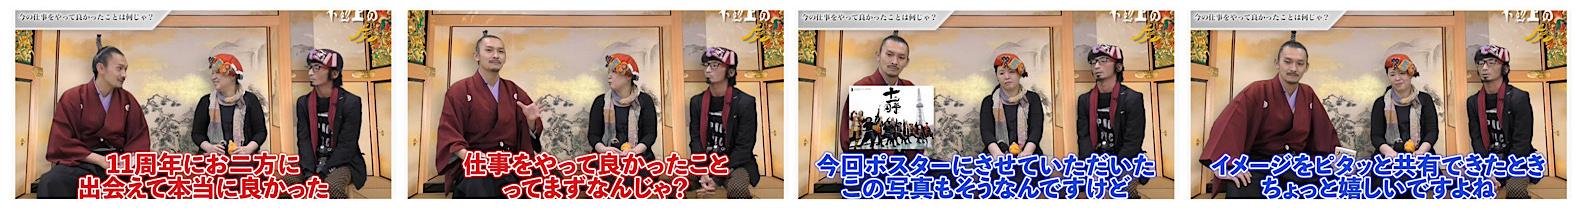 201110_question_8986_yoko.jpg